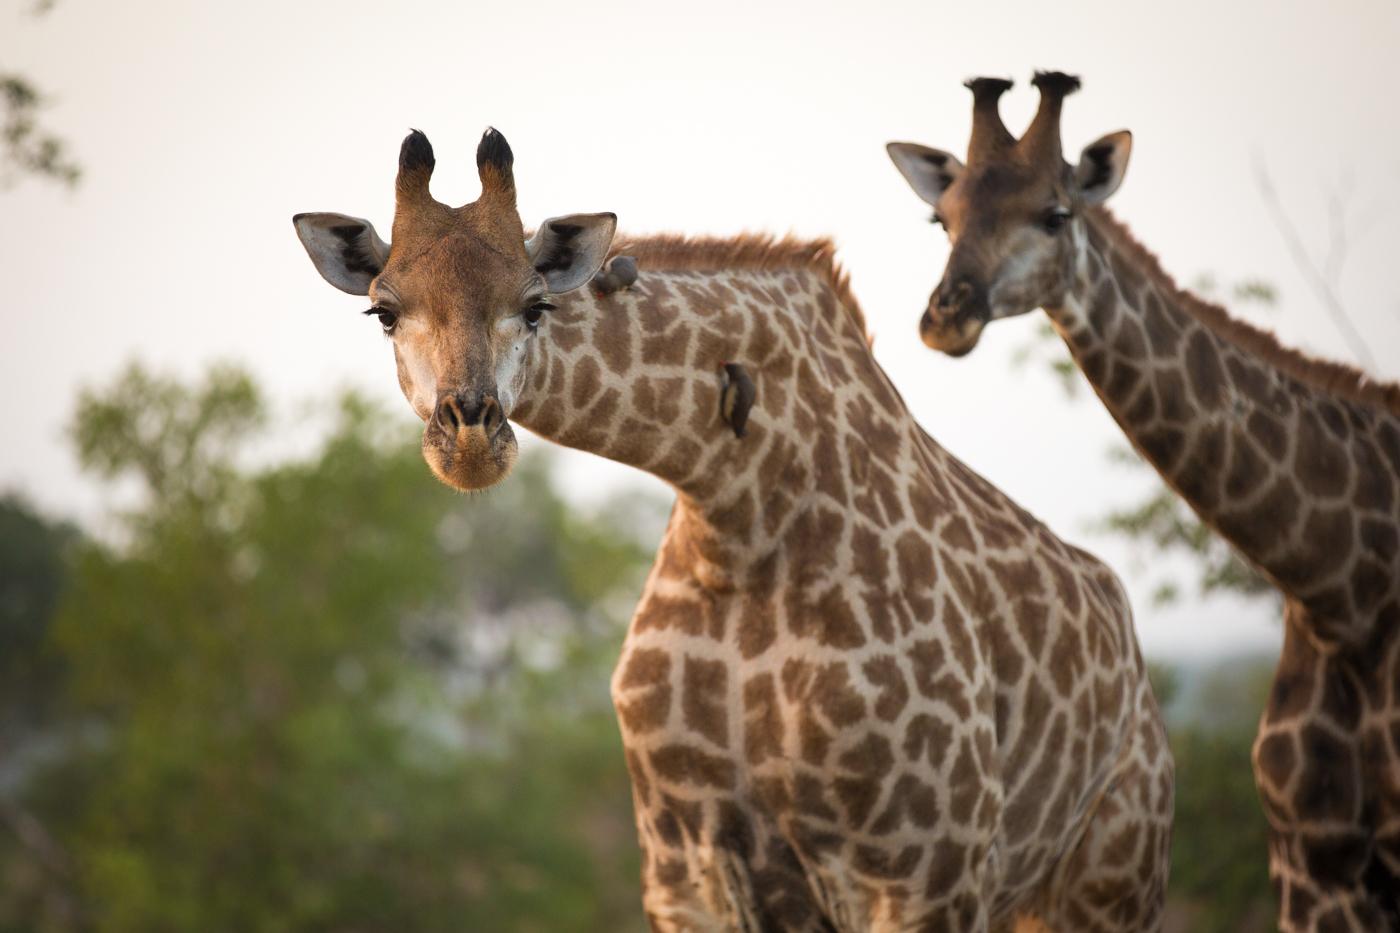 Giraffe Look camera